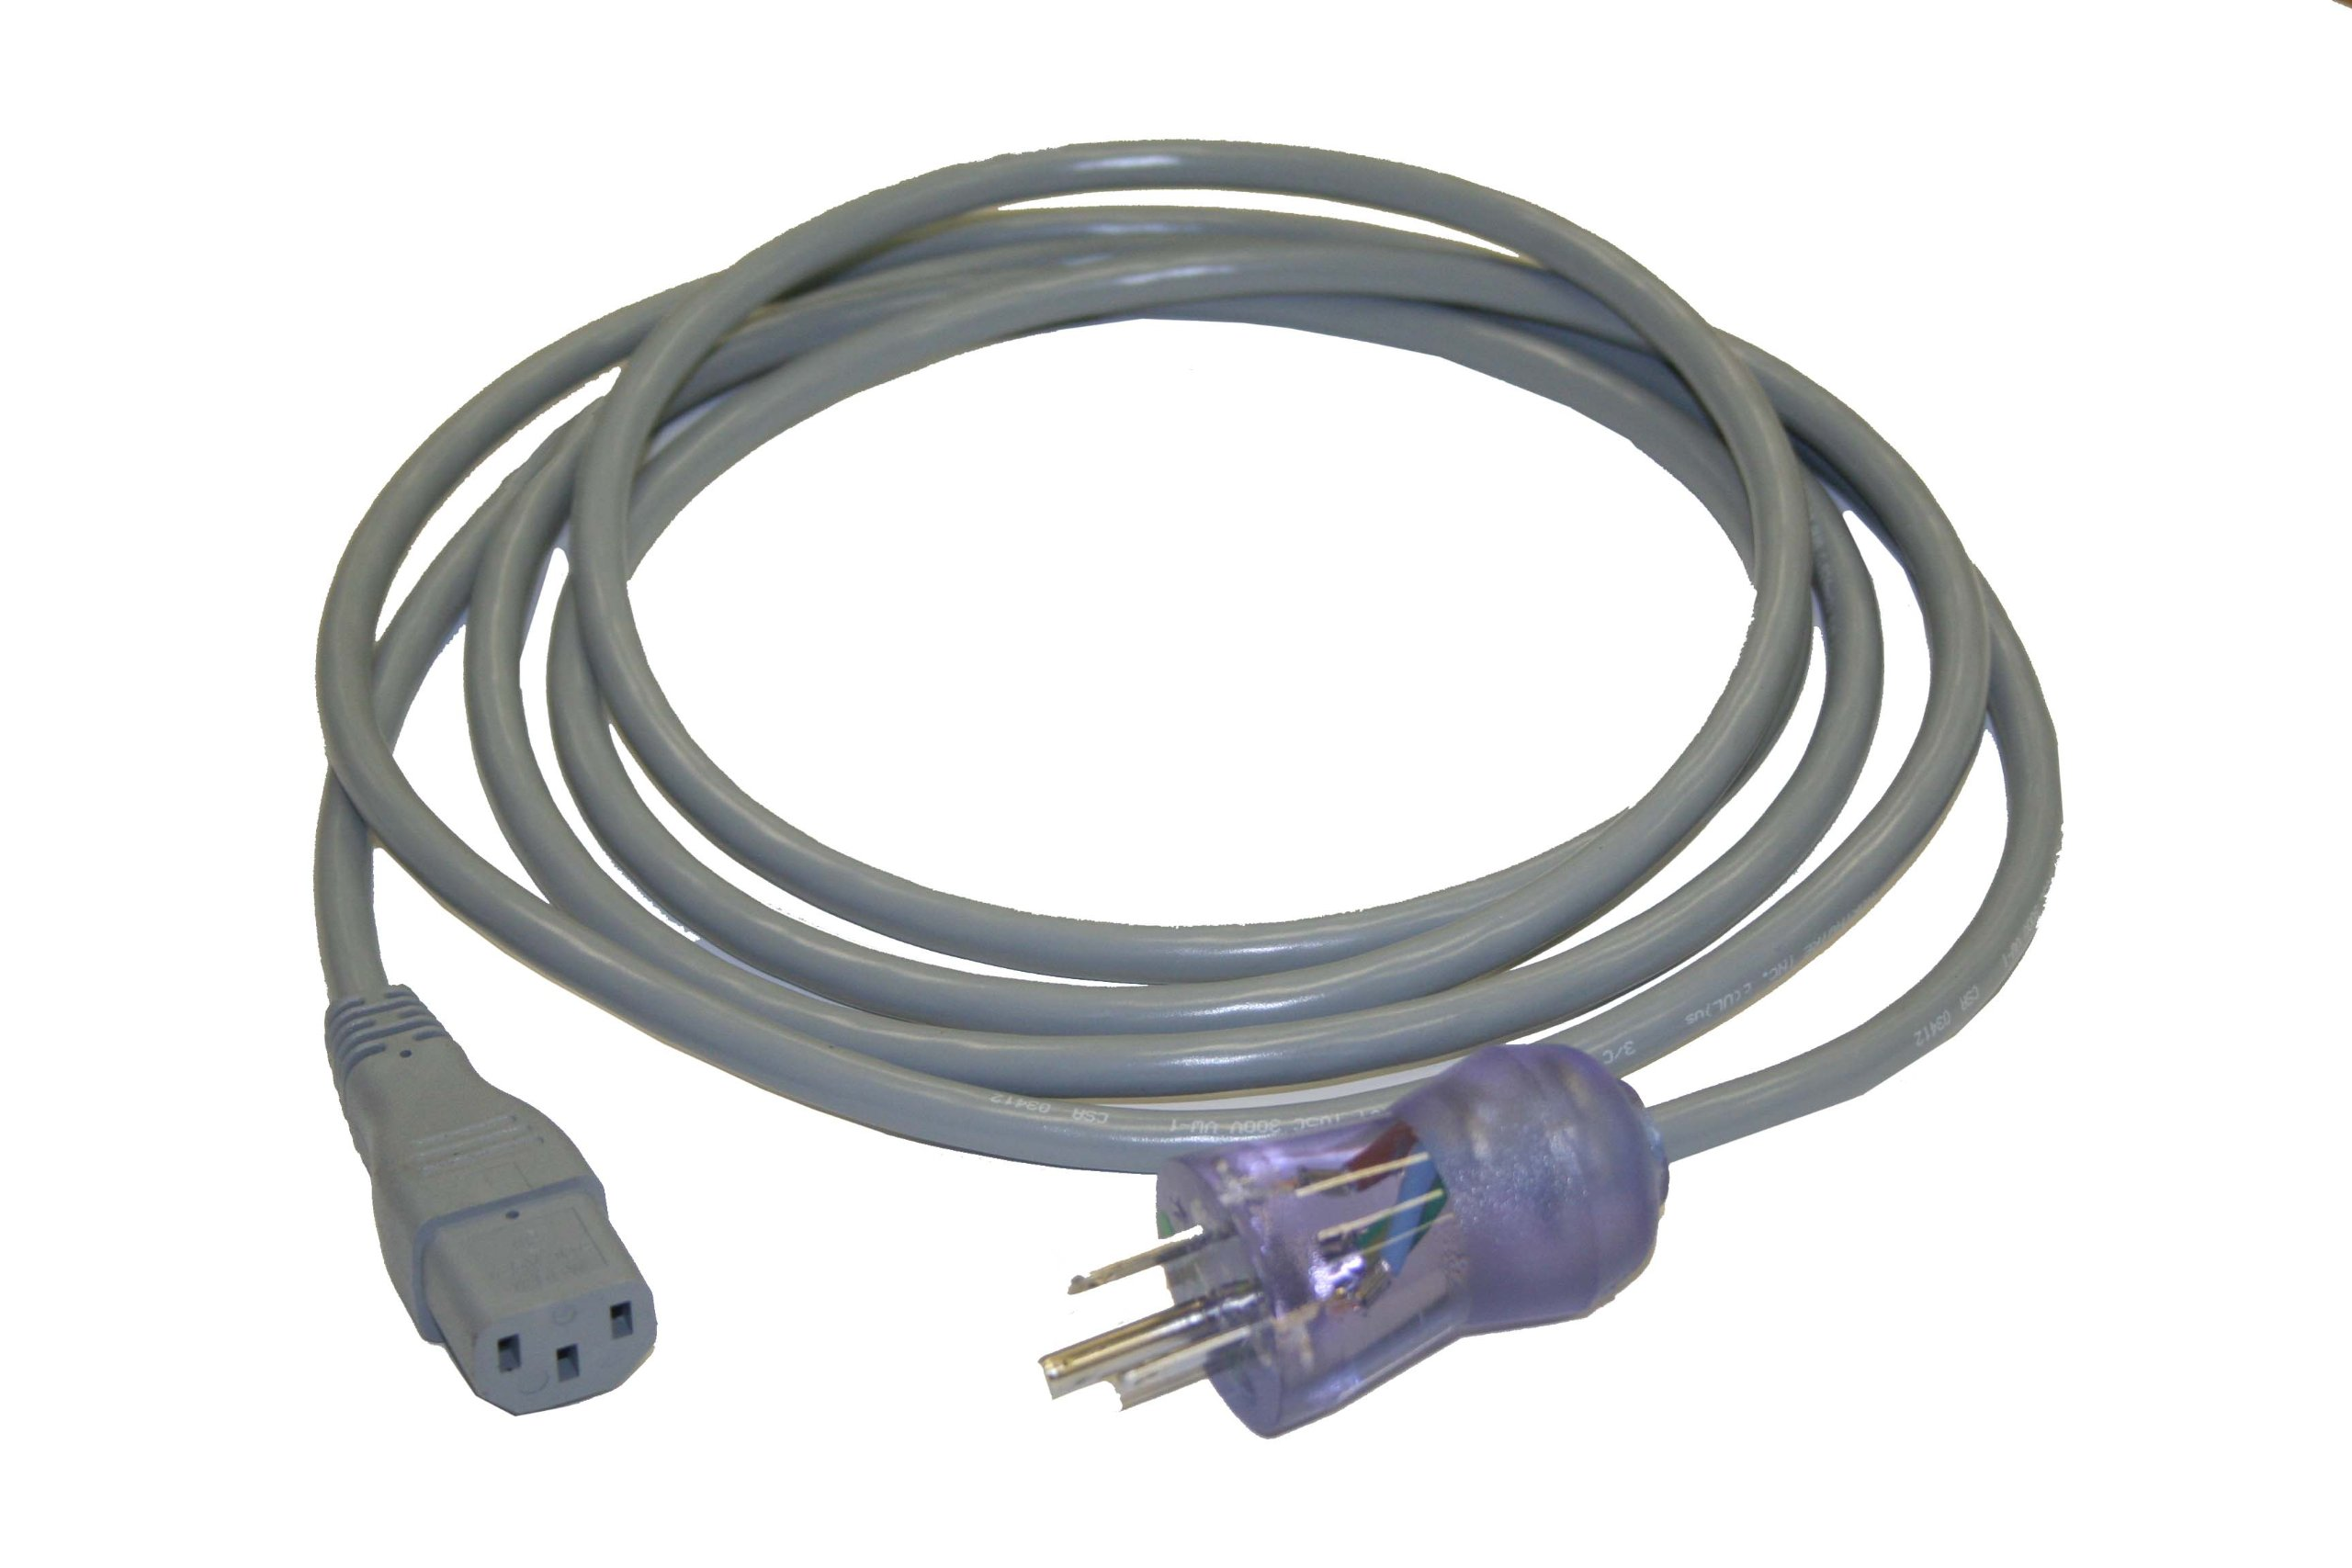 Interpower 86611620 North American Hospital Grade Cord Set, NEMA 5-15 Plug Type, IEC 60320 C13 Connector Type, Gray, 15A Amperage, 125VAC Voltage, 3.05m Length